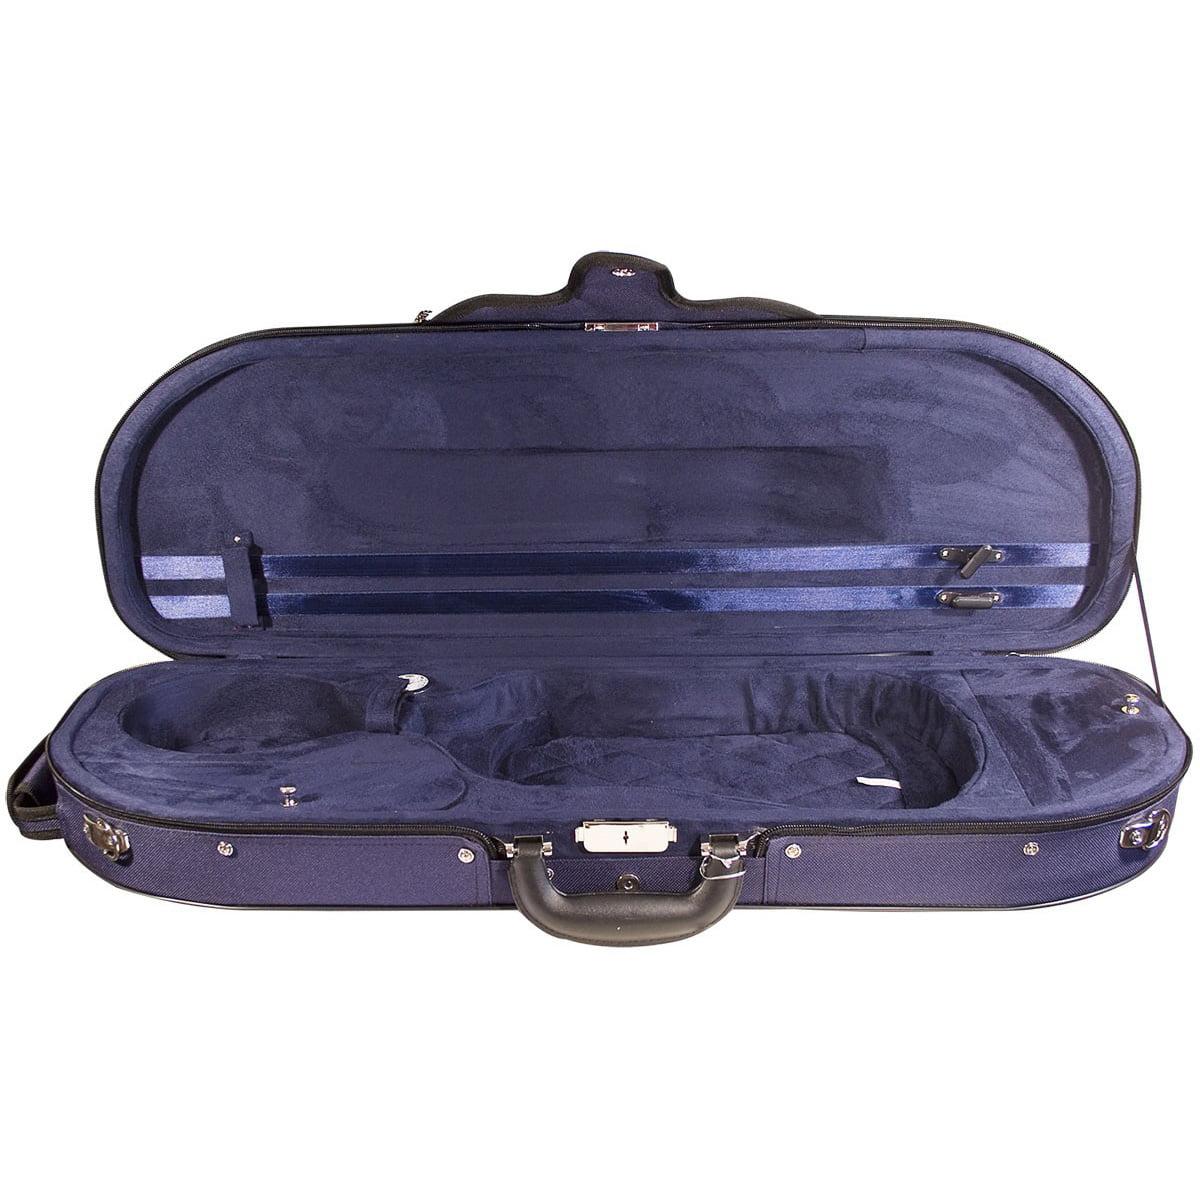 Hidersine Case Violin Super Light D-Shaped vc105_open